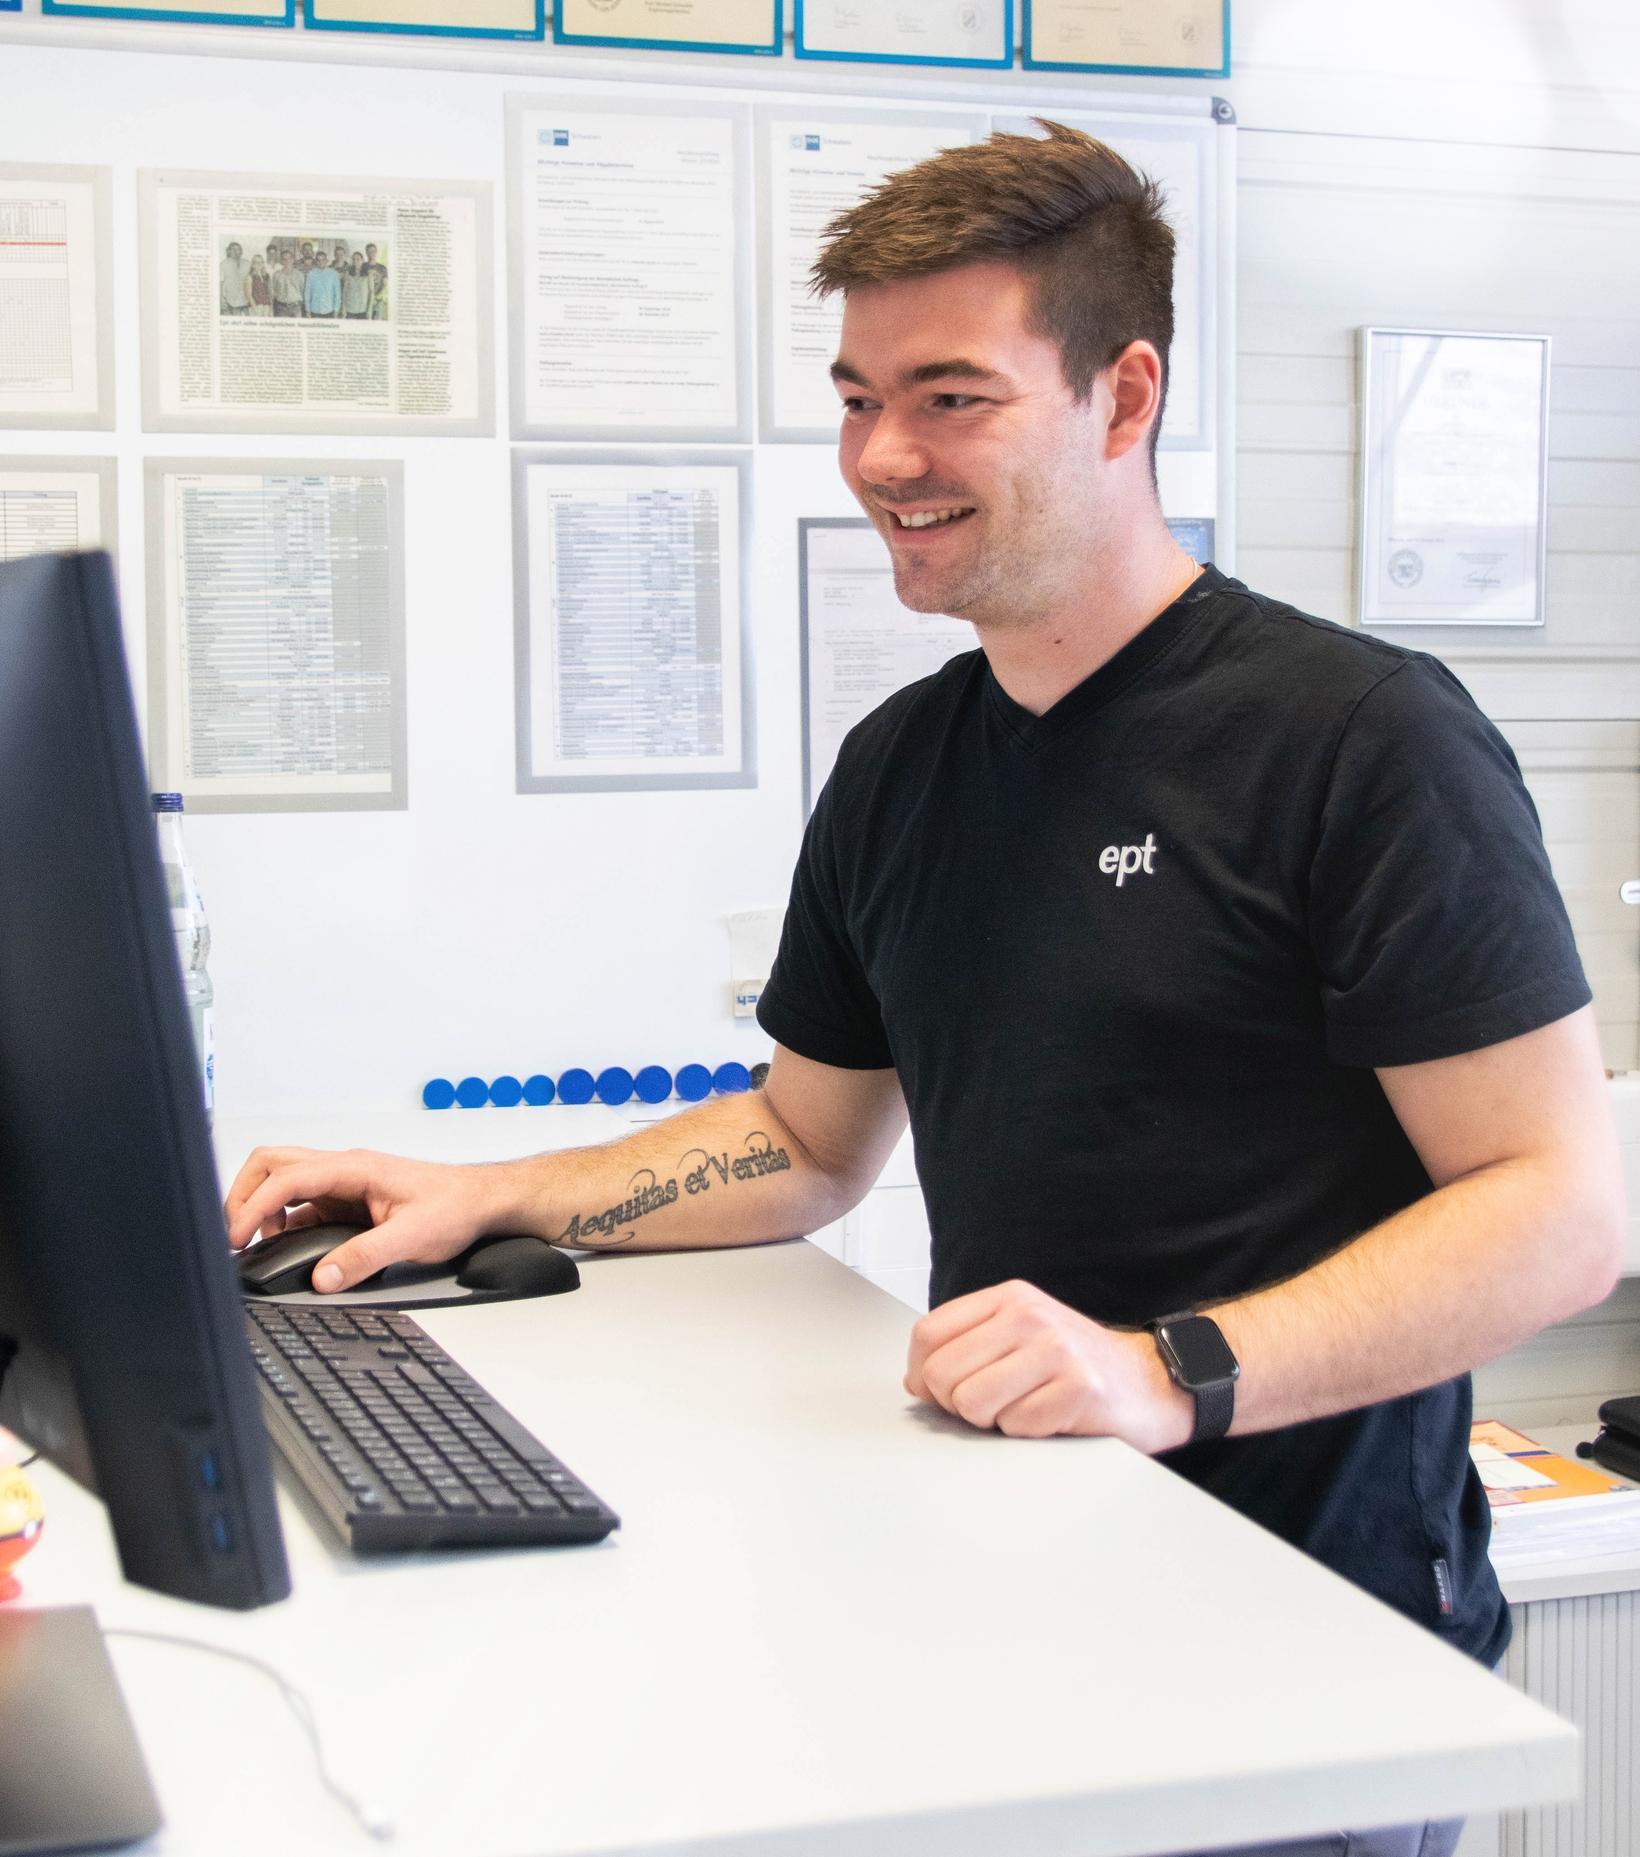 Tobias Blum Arbeitsplatz